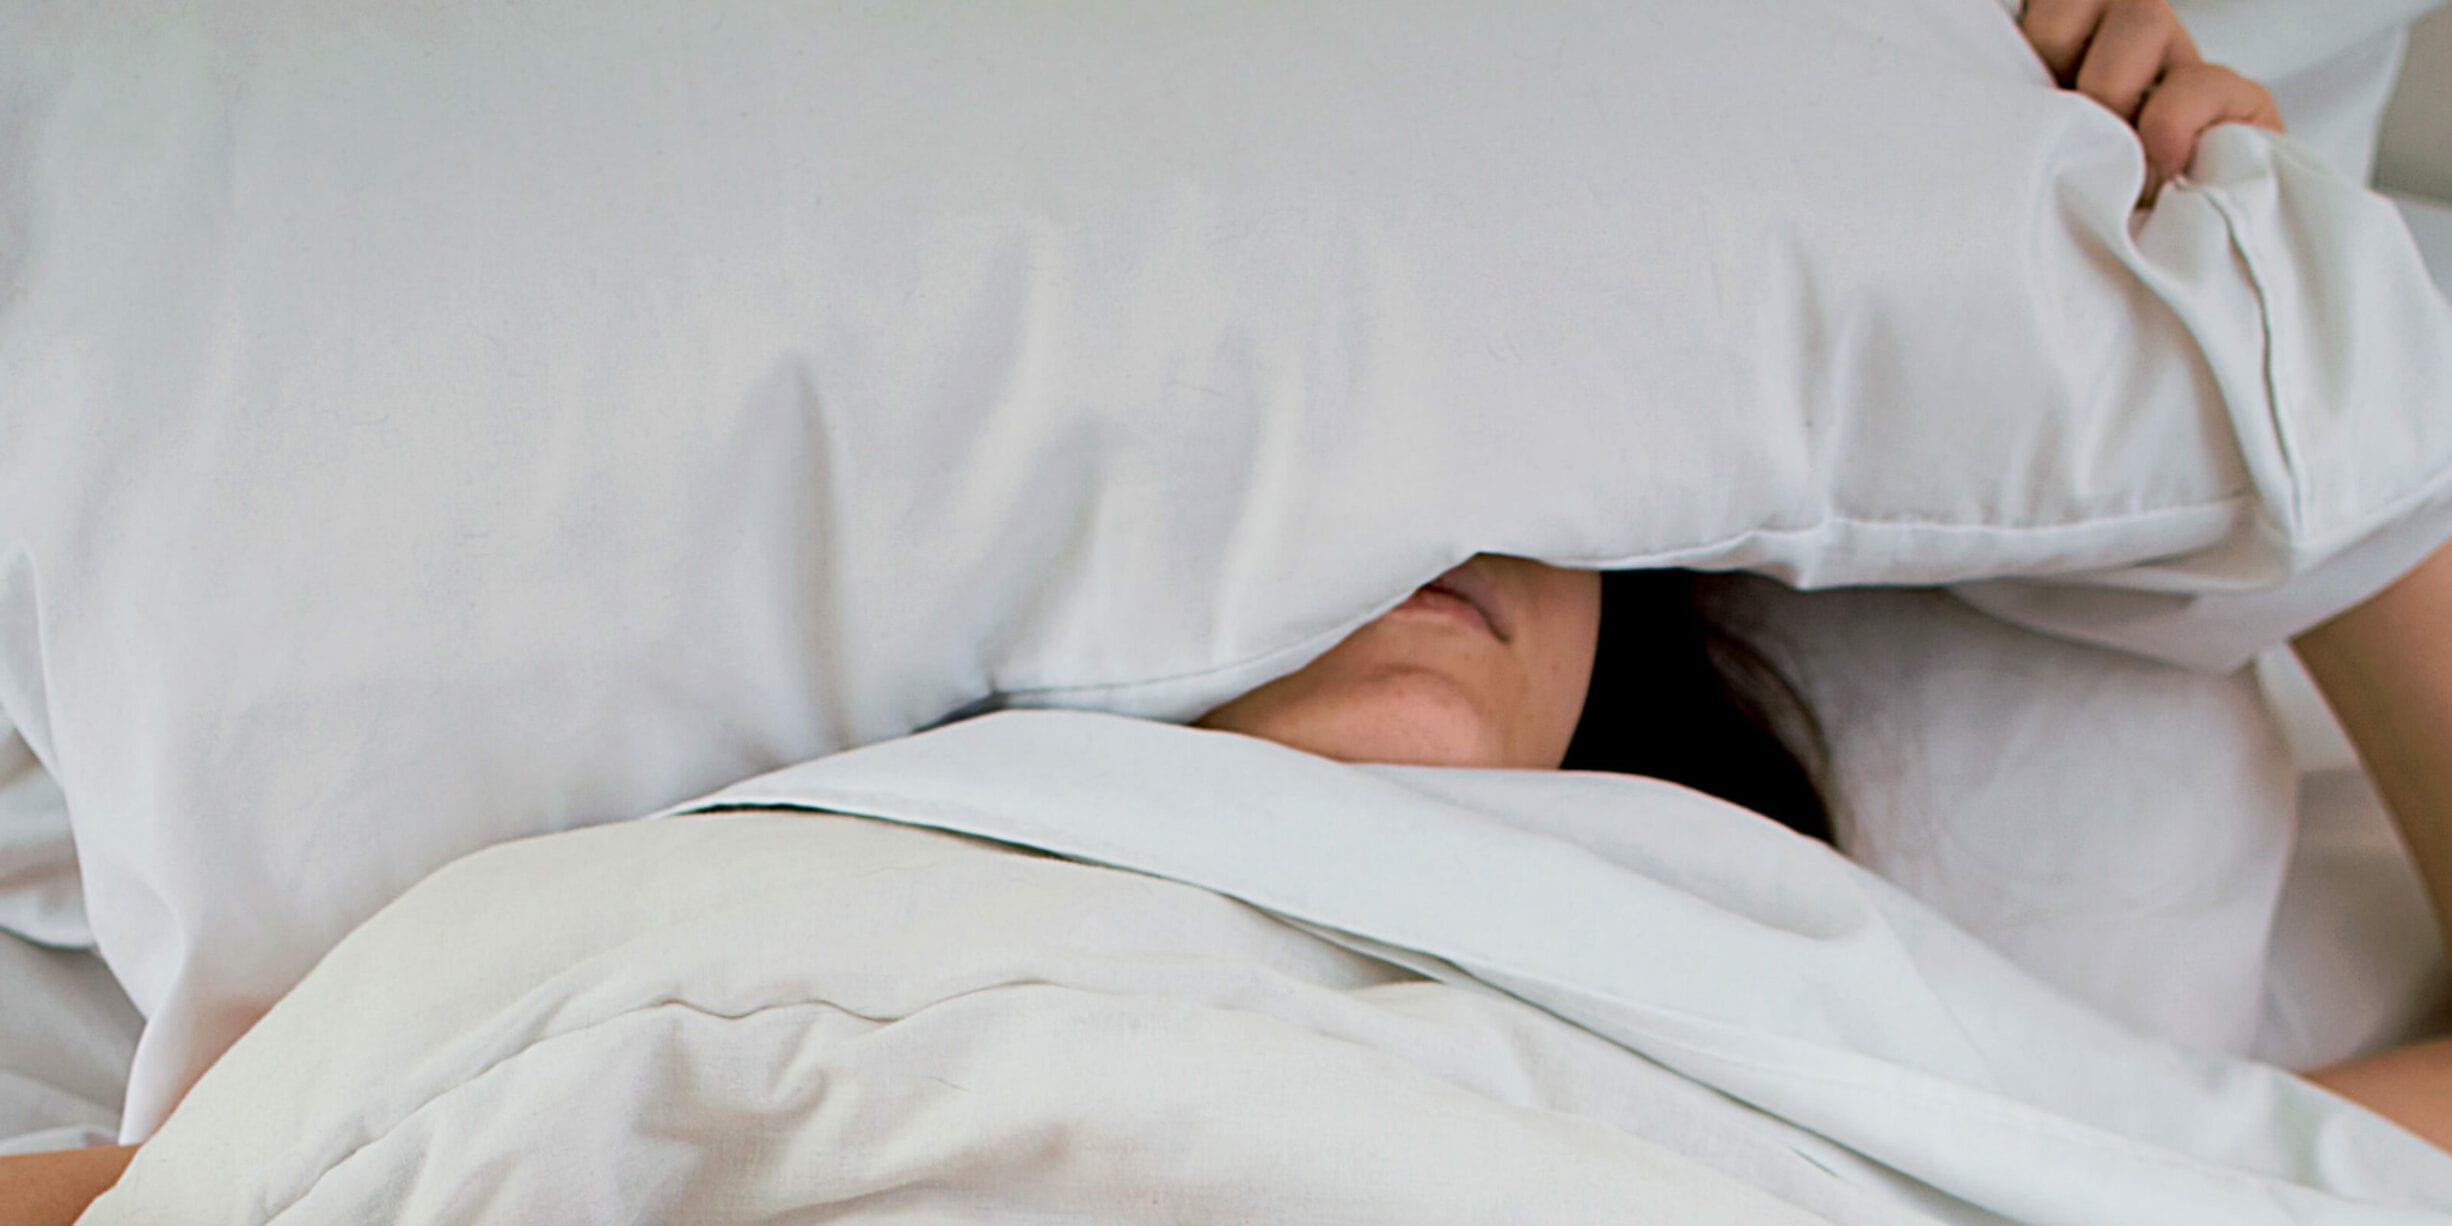 woman sleeping, pillow on head